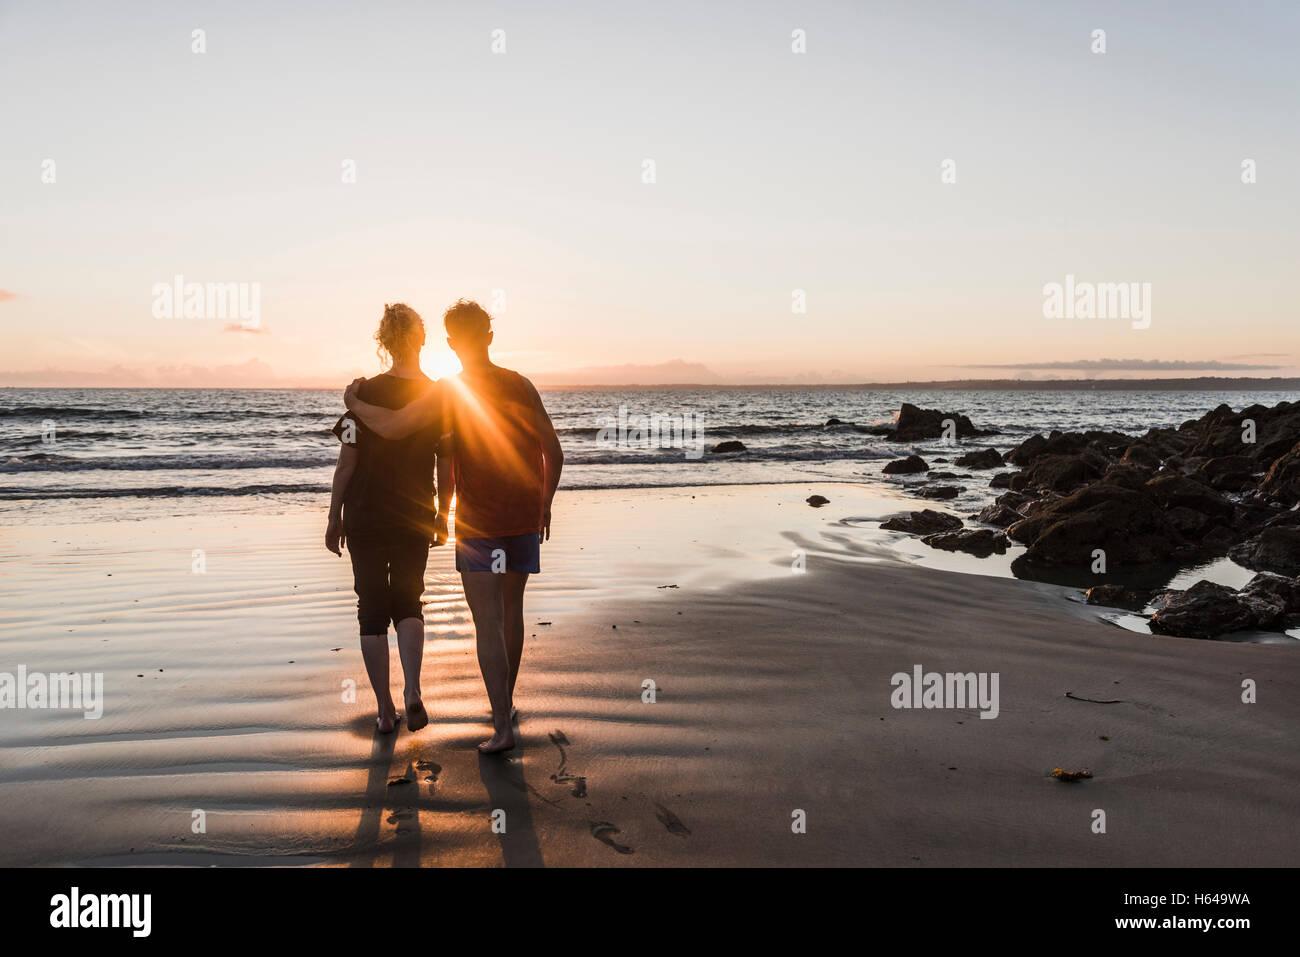 France, Corzon peninsula, couple walking on beach at sunset - Stock Image